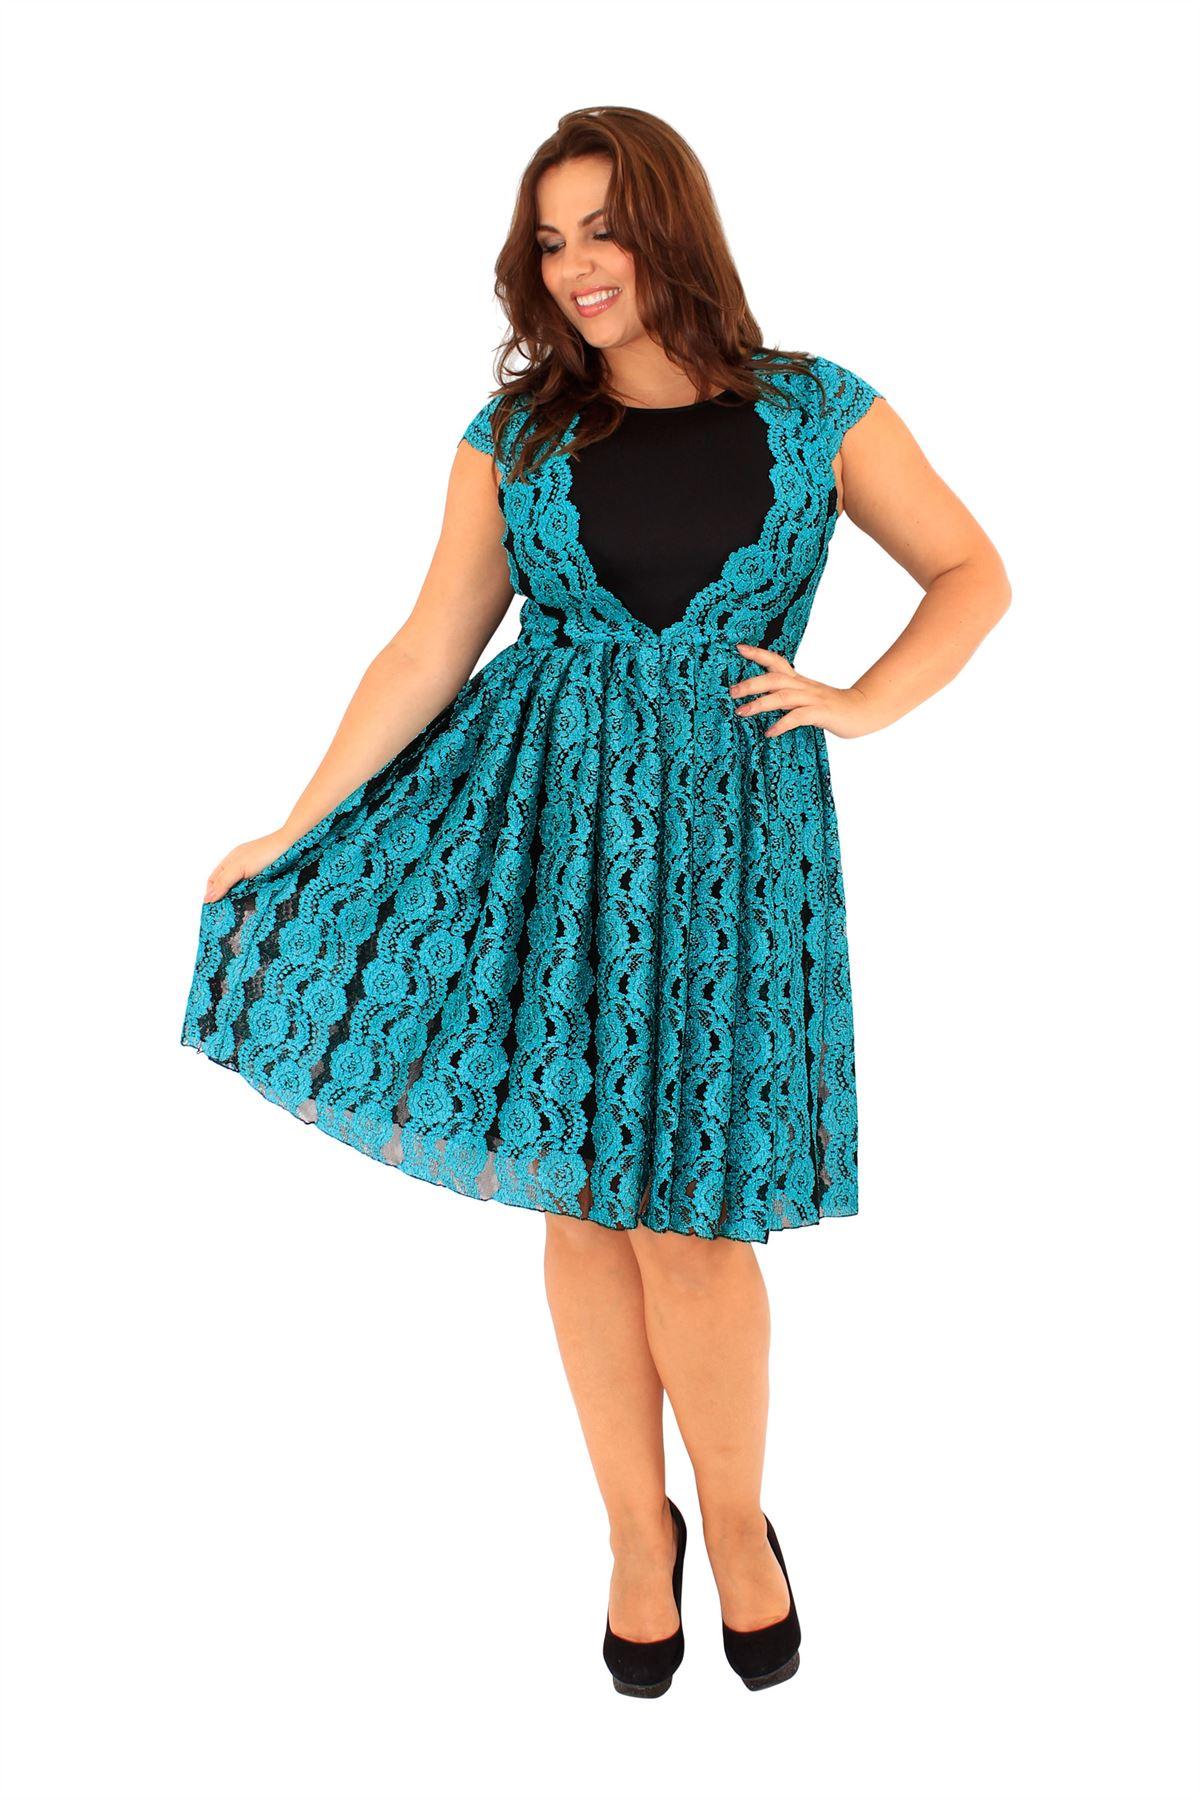 Ebay Uk Evening Dresses Size 18 - Plus Size Prom Dresses